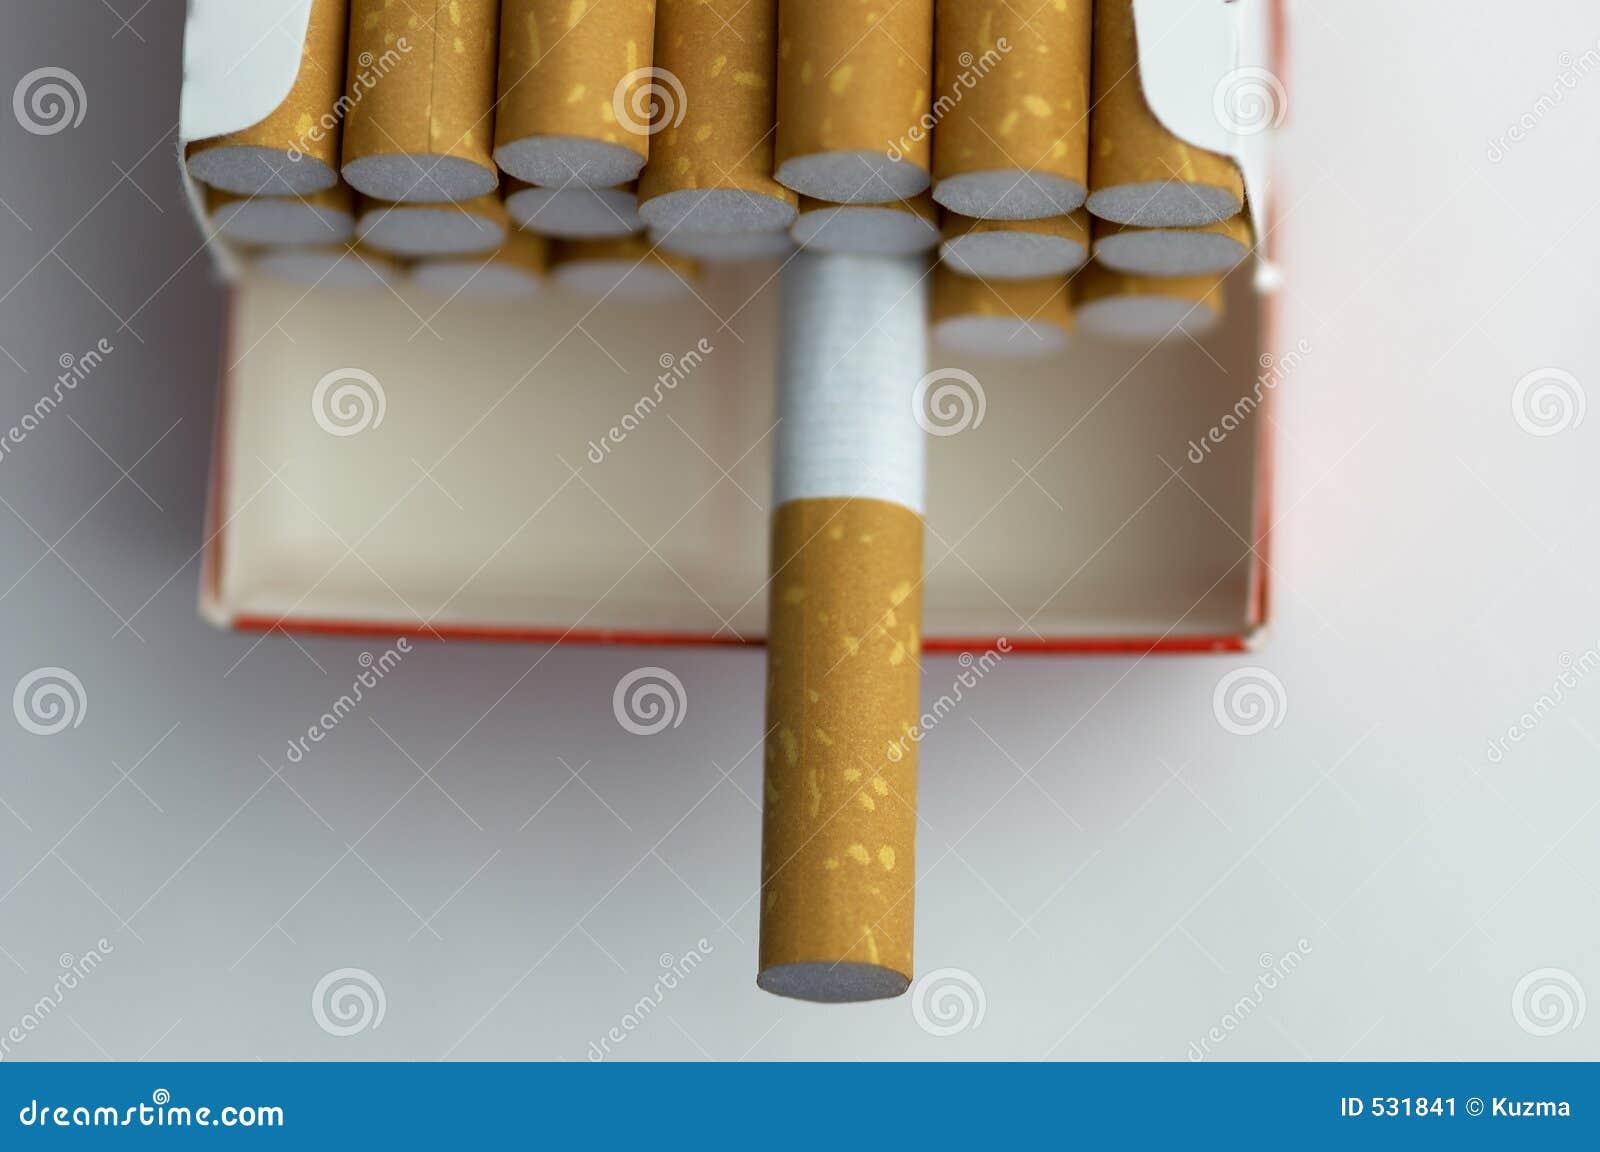 Download 香烟宏观装箱 库存图片. 图片 包括有 缺点, 关闭, 呼吸, 烟草, 害处, 烧伤, 概念性, 癌症, 尼古丁 - 531841